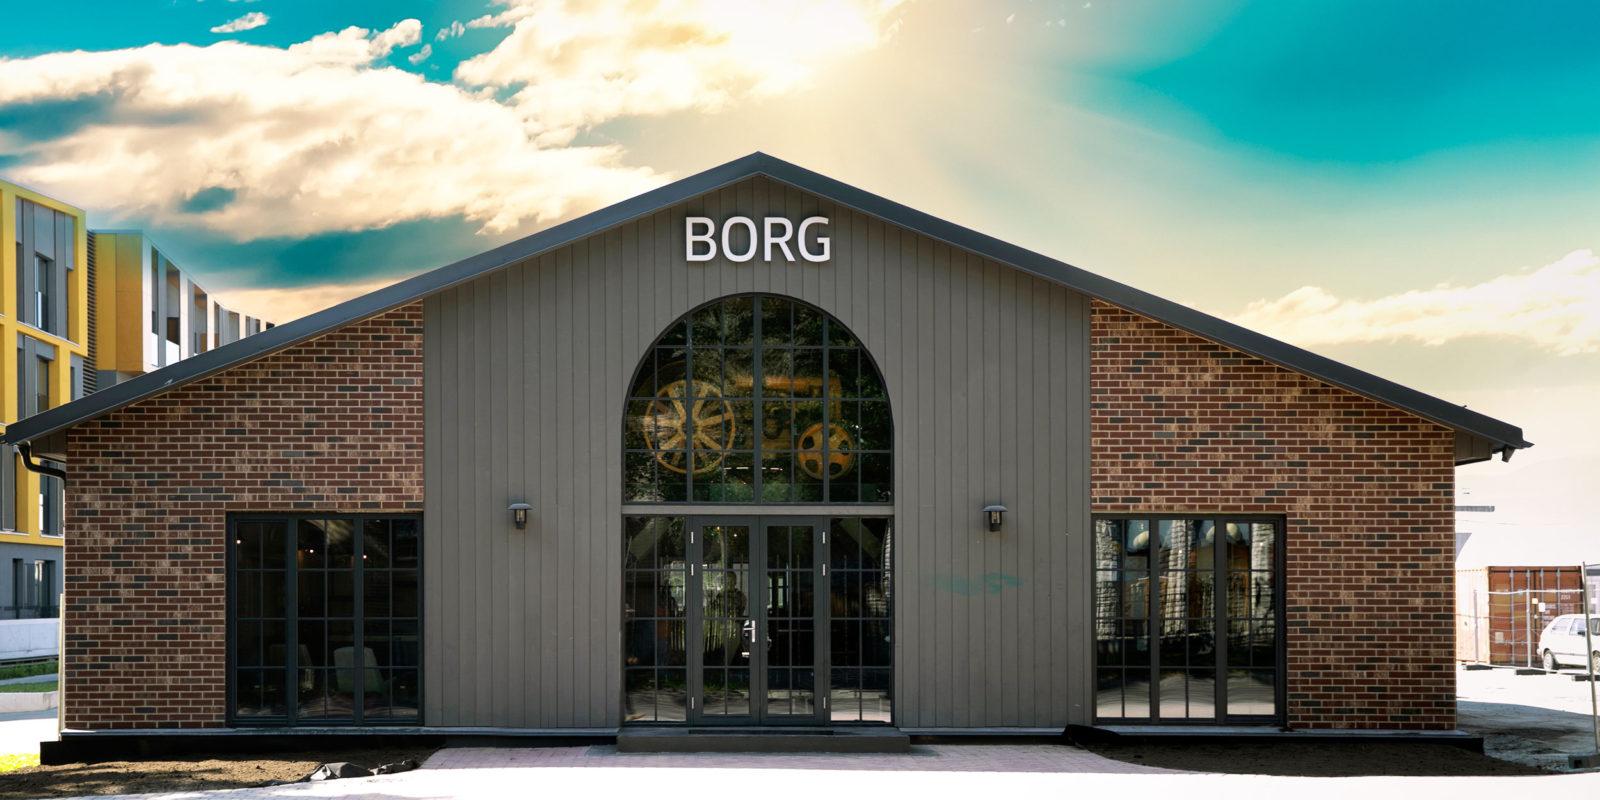 Borg mööbel